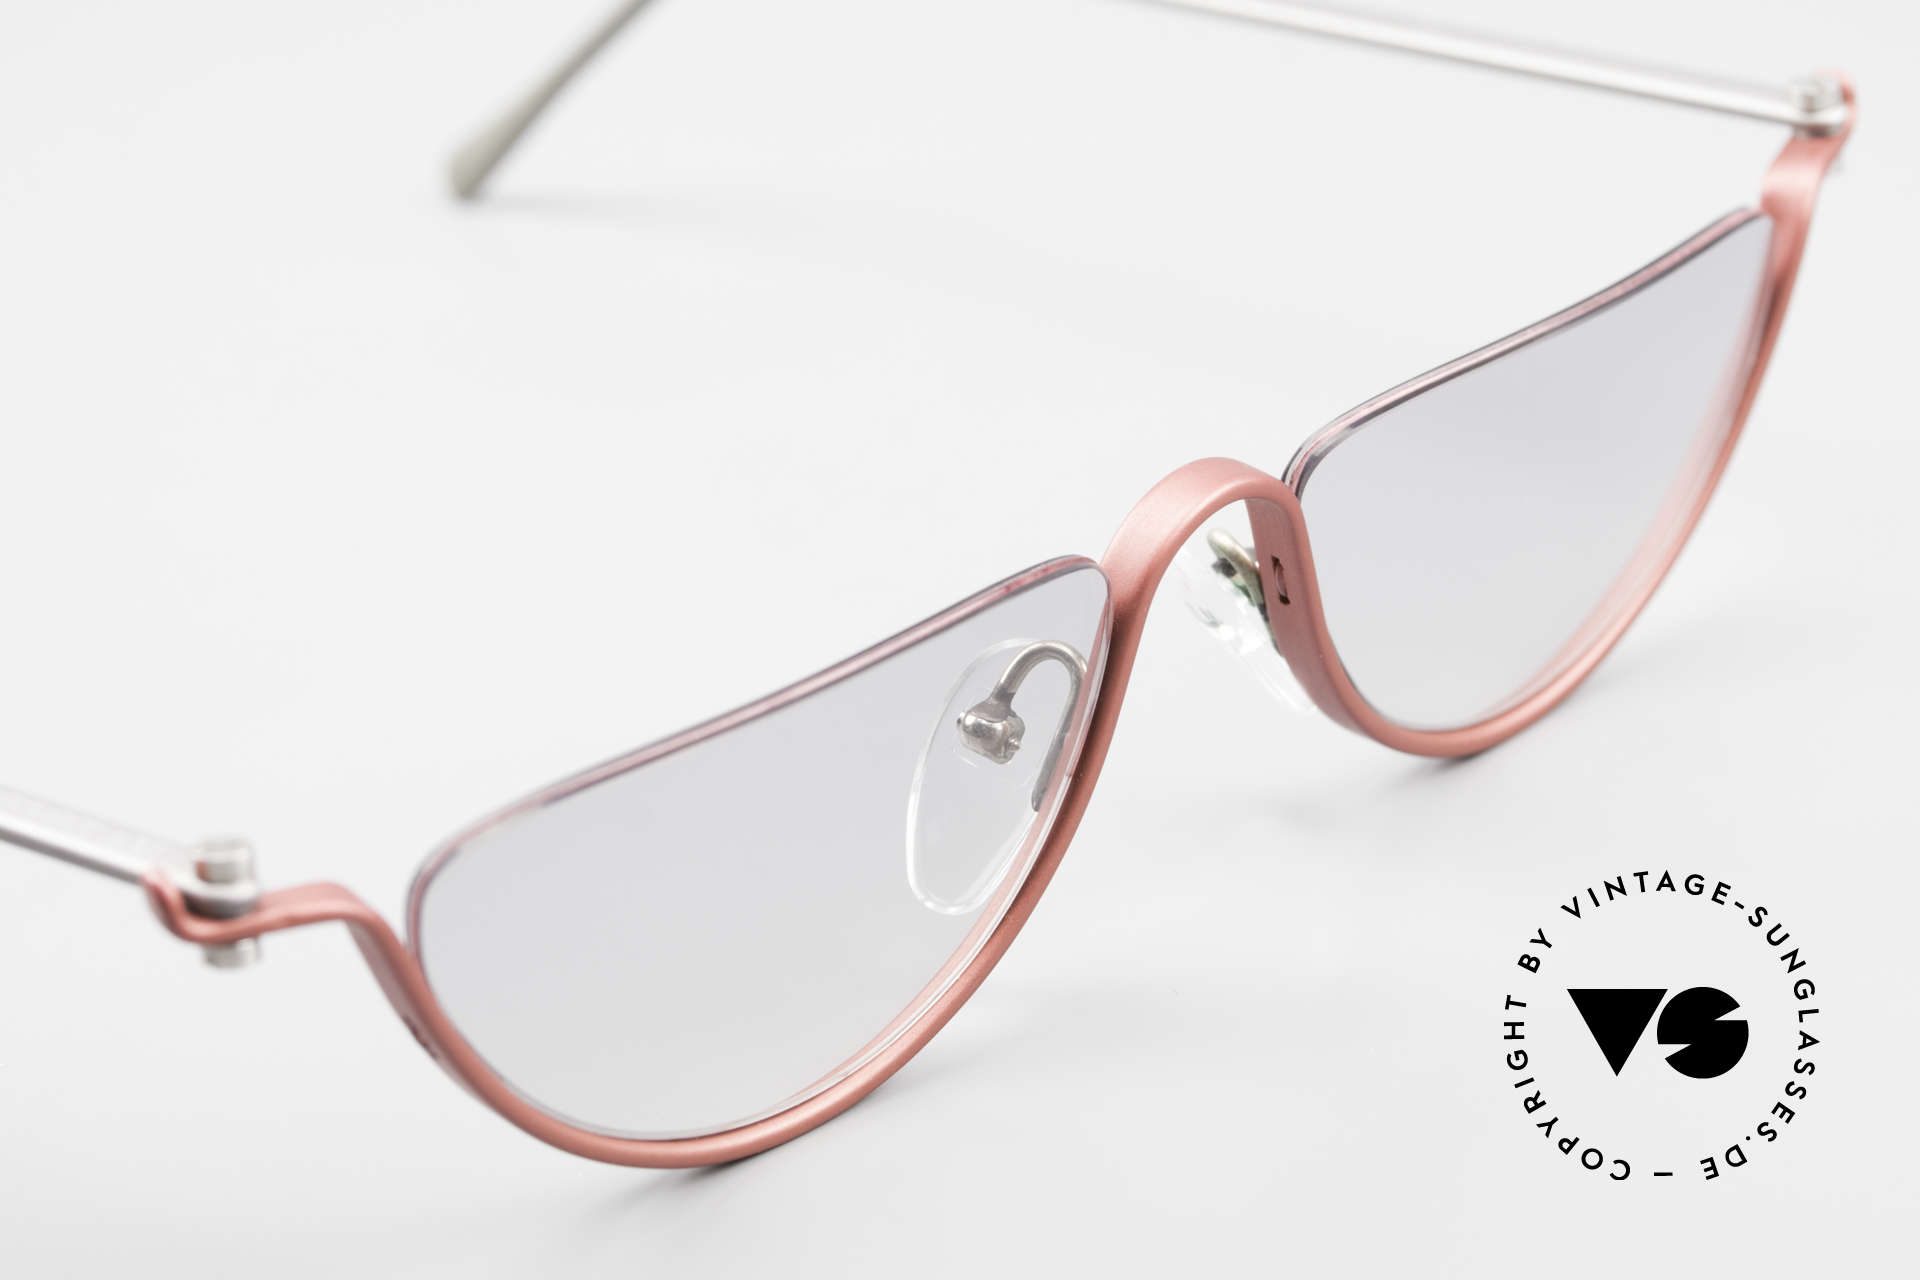 ProDesign No11 Gail Spence Design Sunglasses, ultra RARE designer sunglasses from the mid 1990's, Made for Women